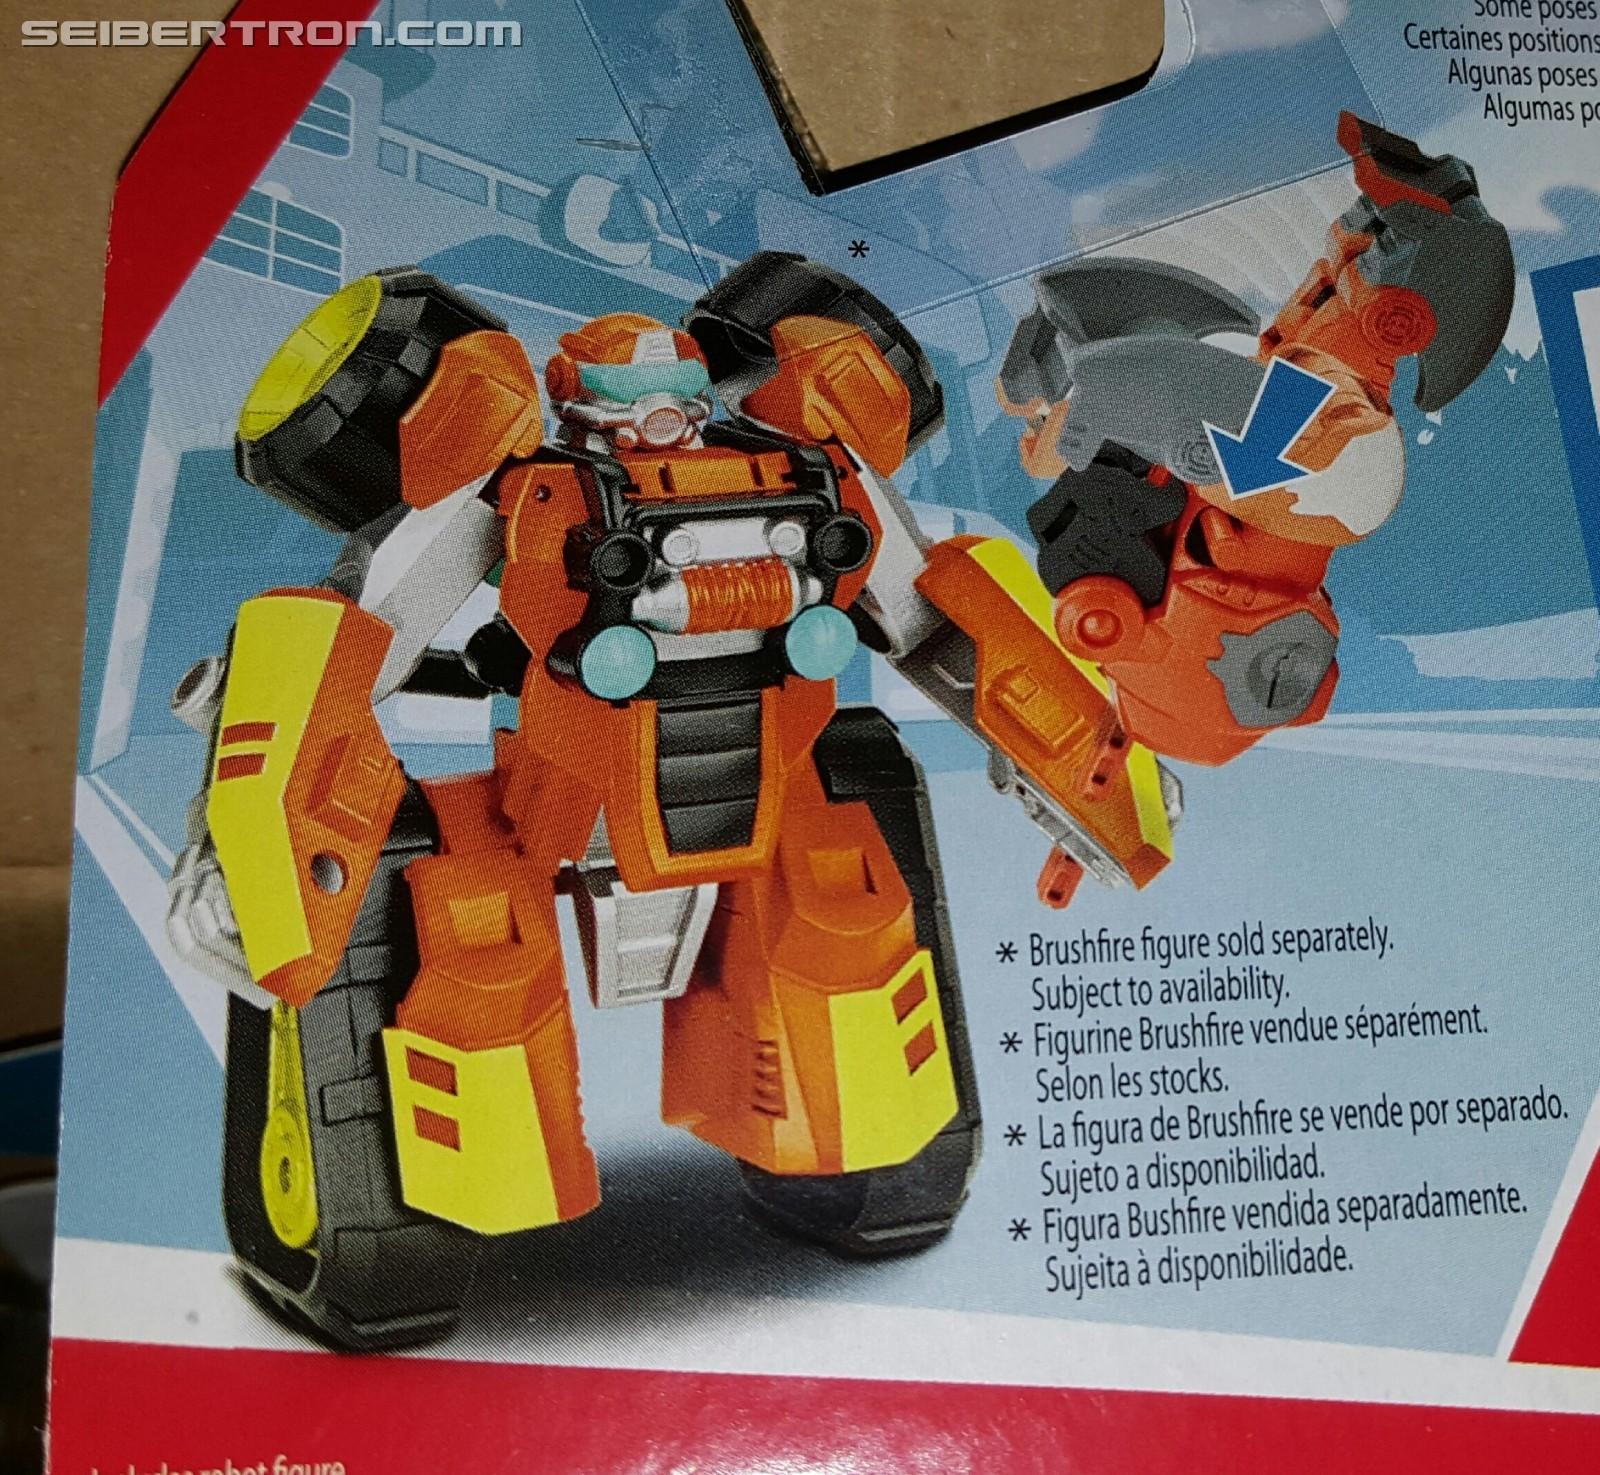 Transformers Rescue Bots Atv Brushfire Revealed Sequoia